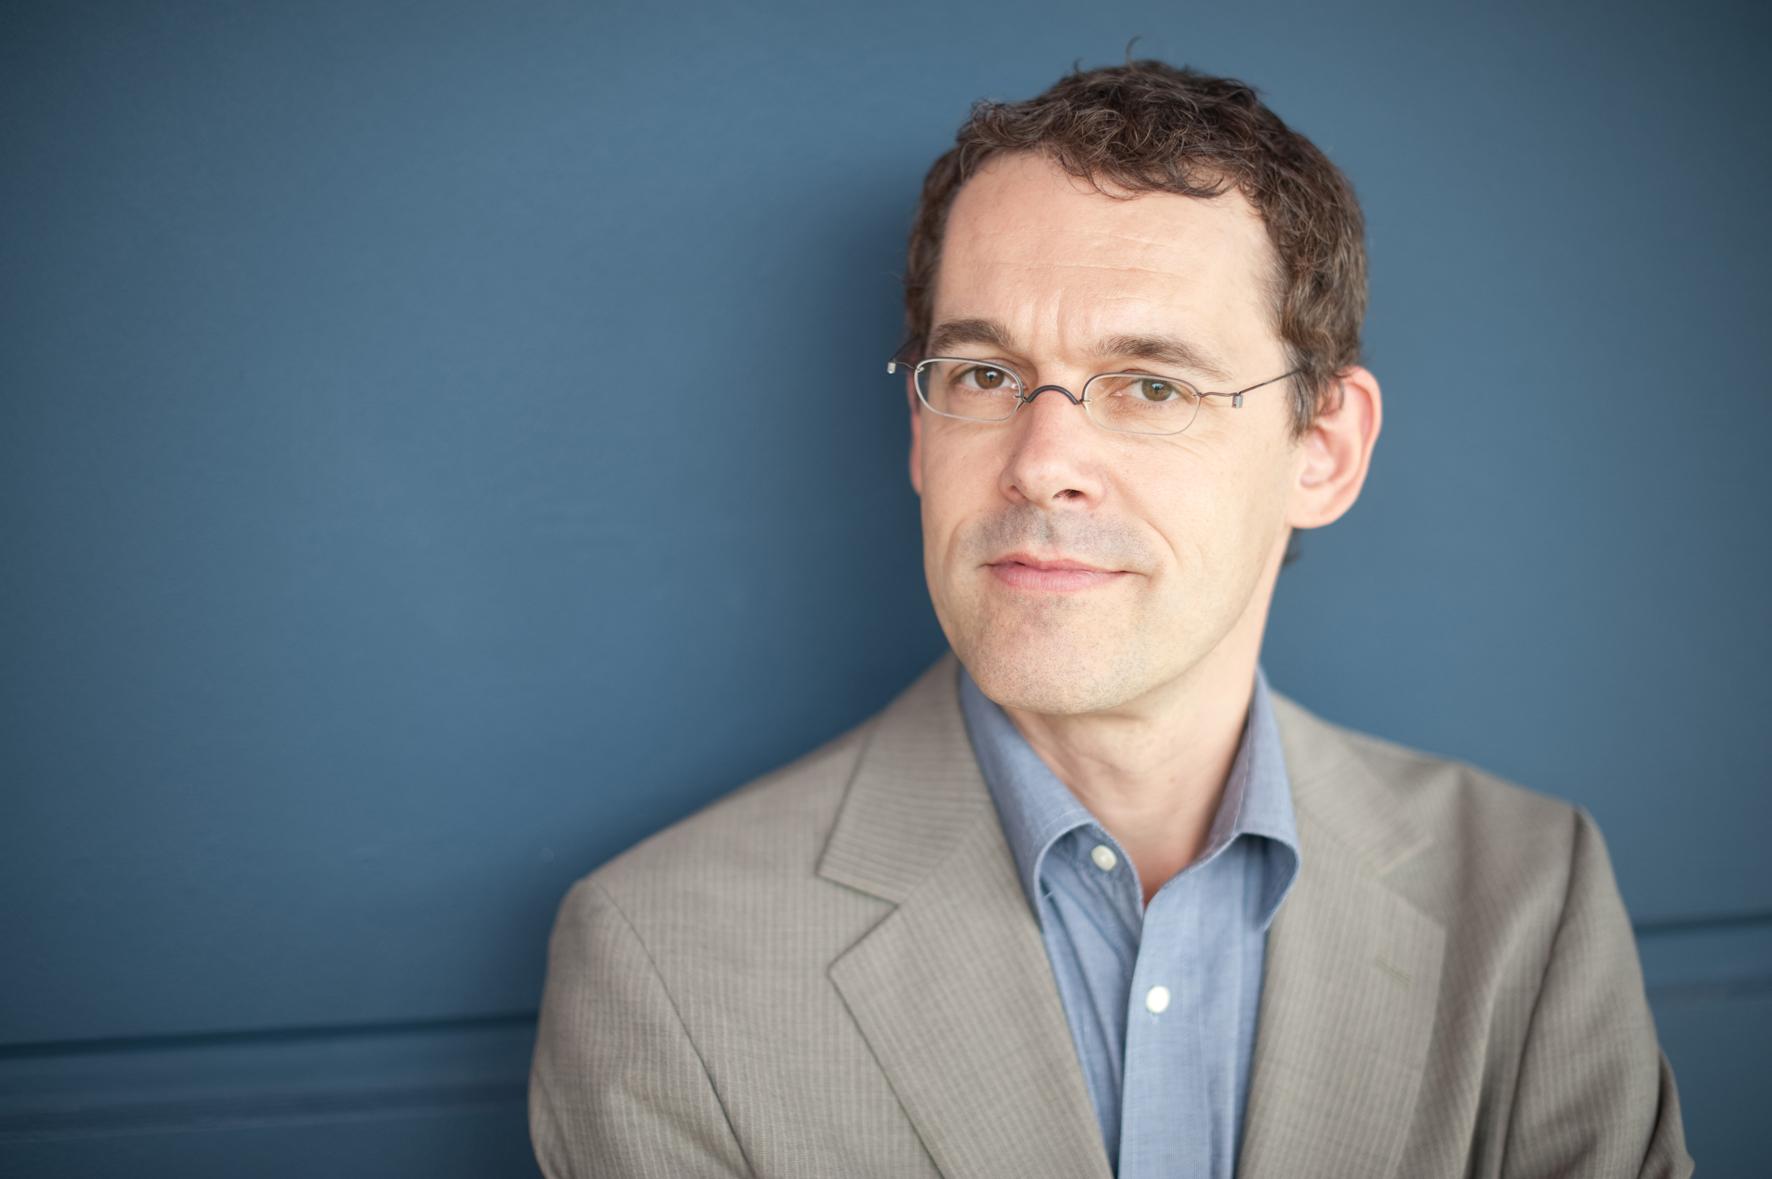 Prof. Dr. Christop Schulz